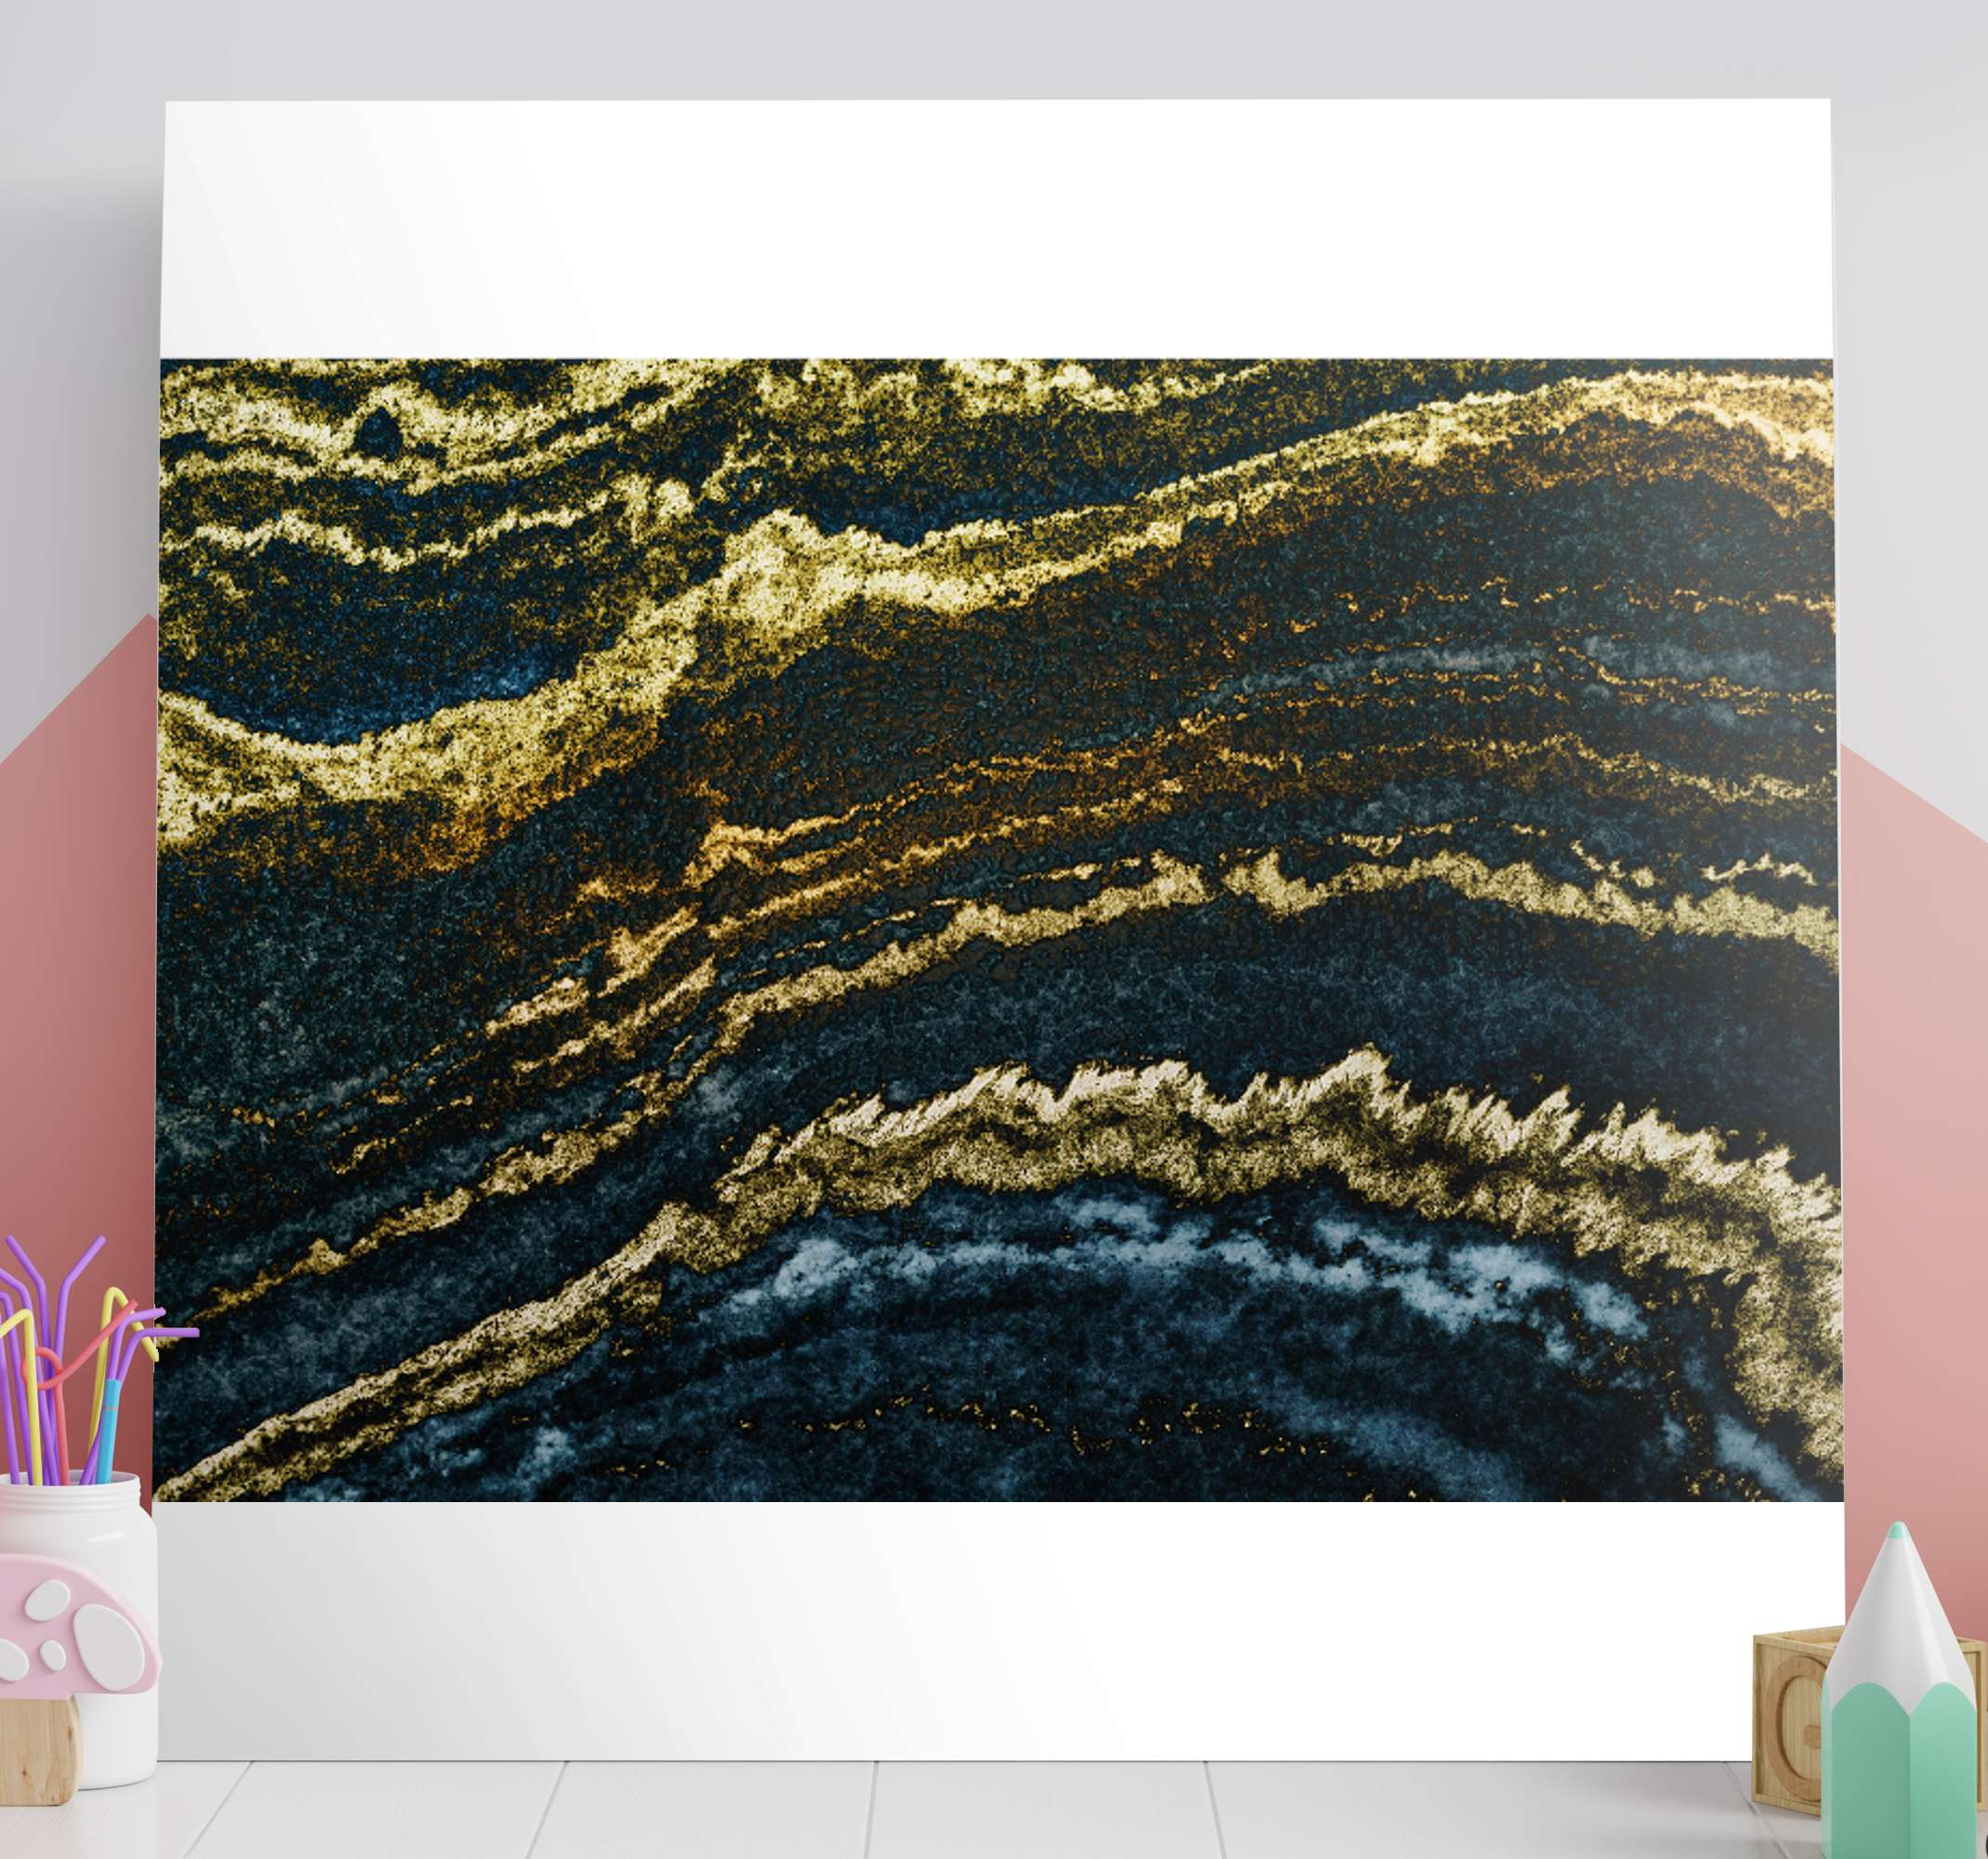 TenStickers. 现代黄金3d壁画艺术版画. 现代金色3d画布打印,以美丽的抽象色彩完成您的家居装饰。它是原始的,经久耐用的,并且印刷质量很高。